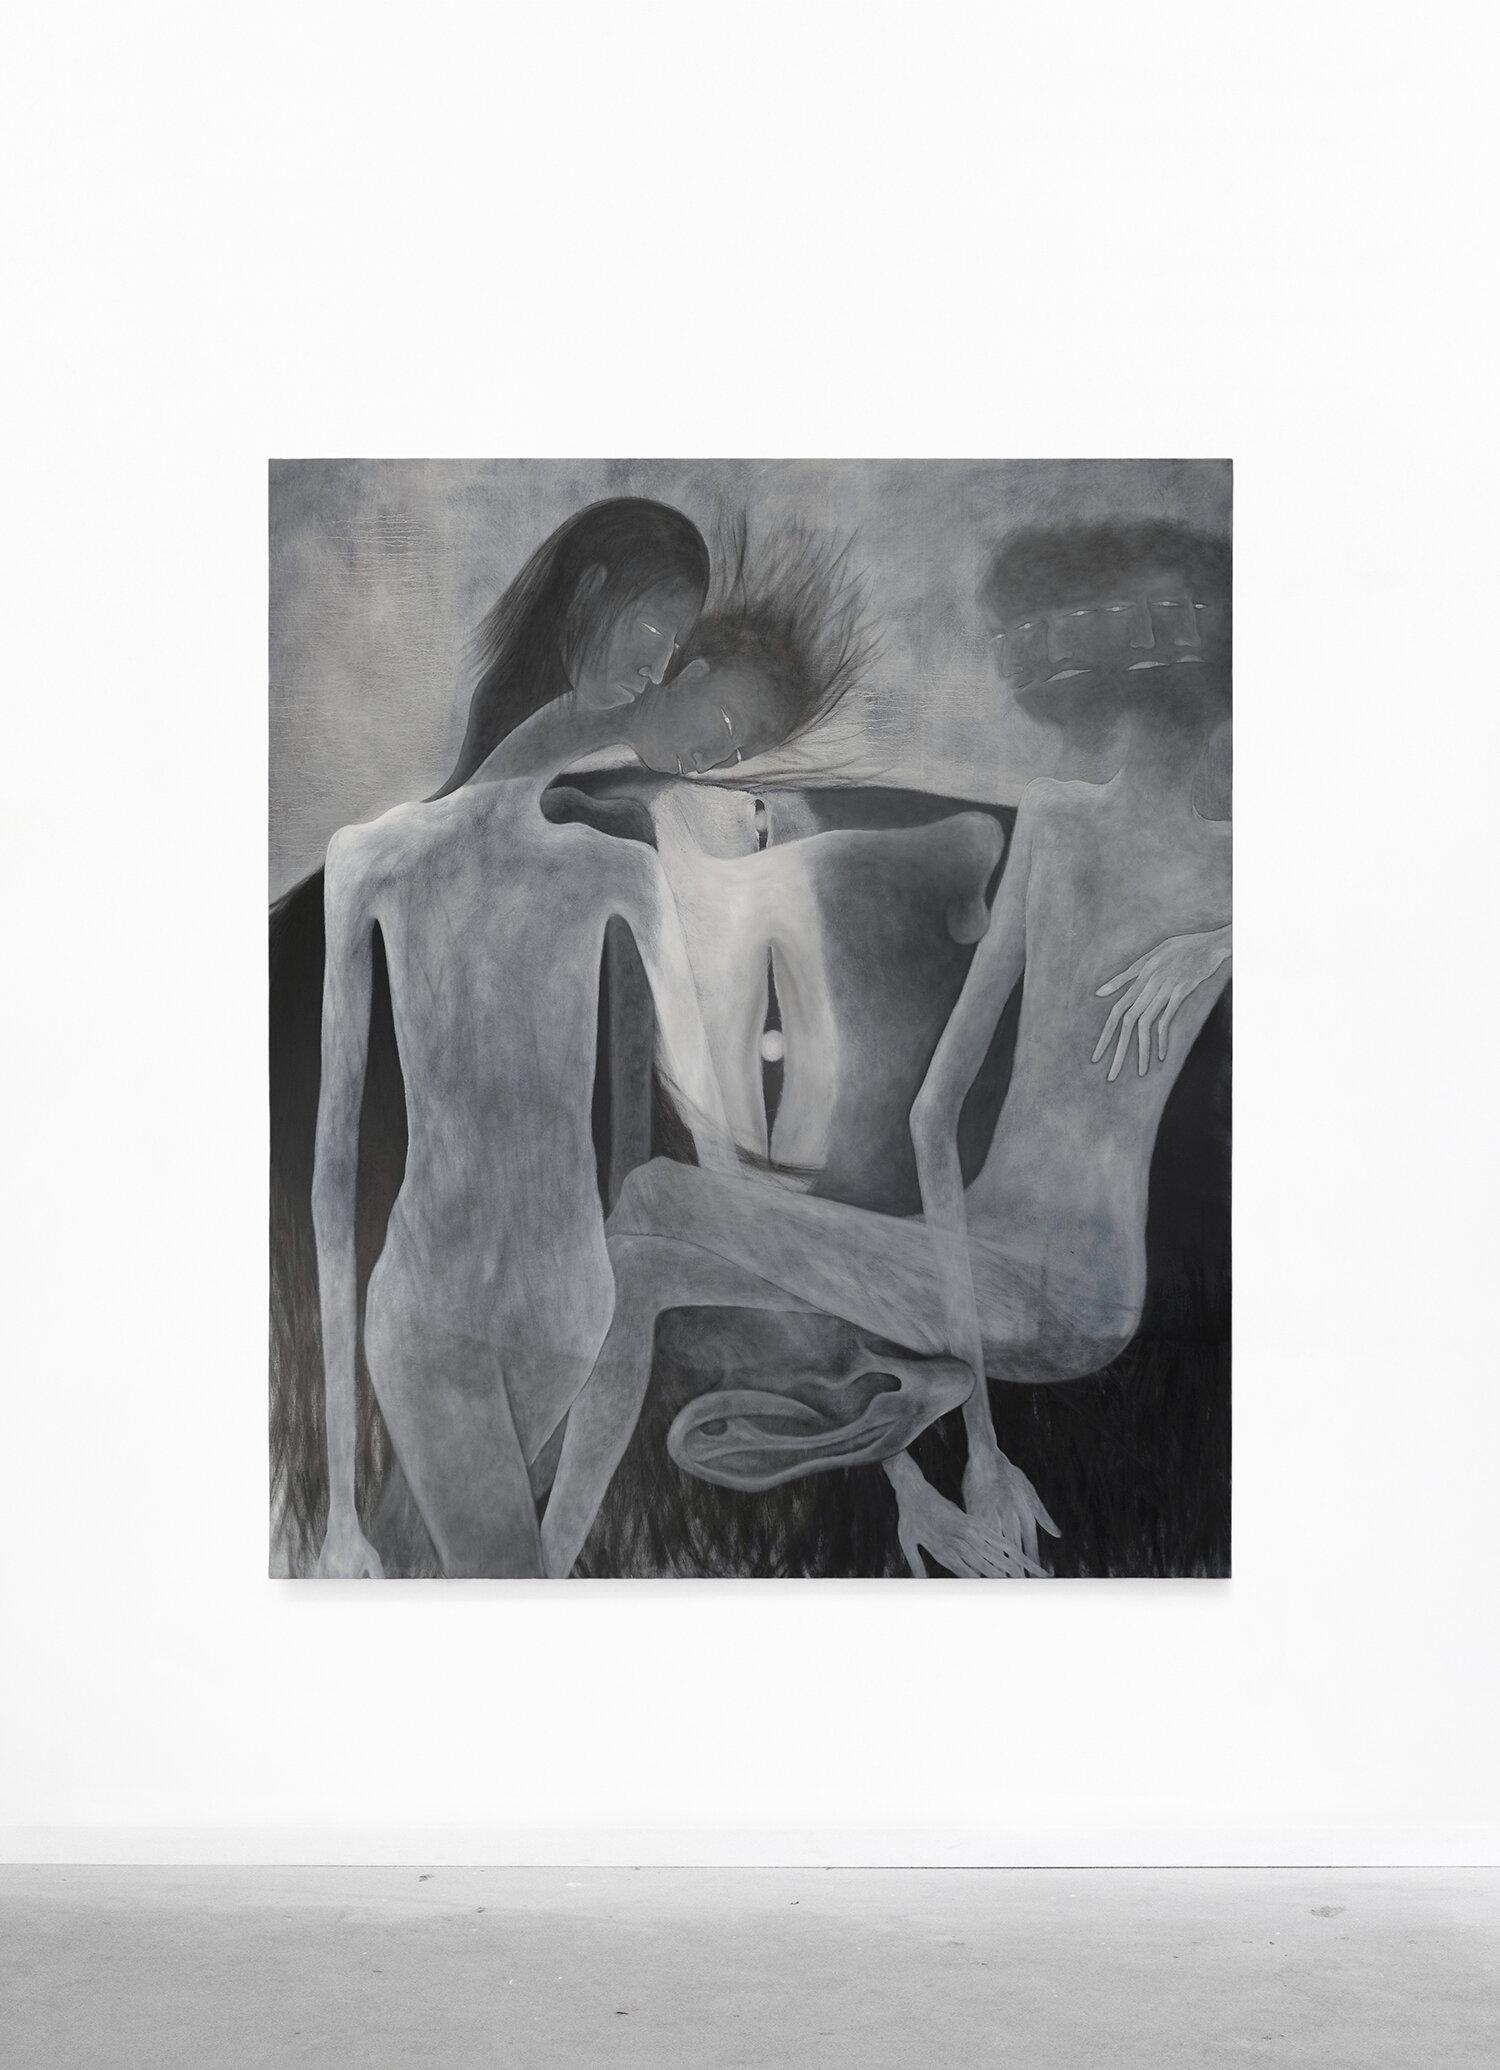 S. Derviz, Untitled, 2019